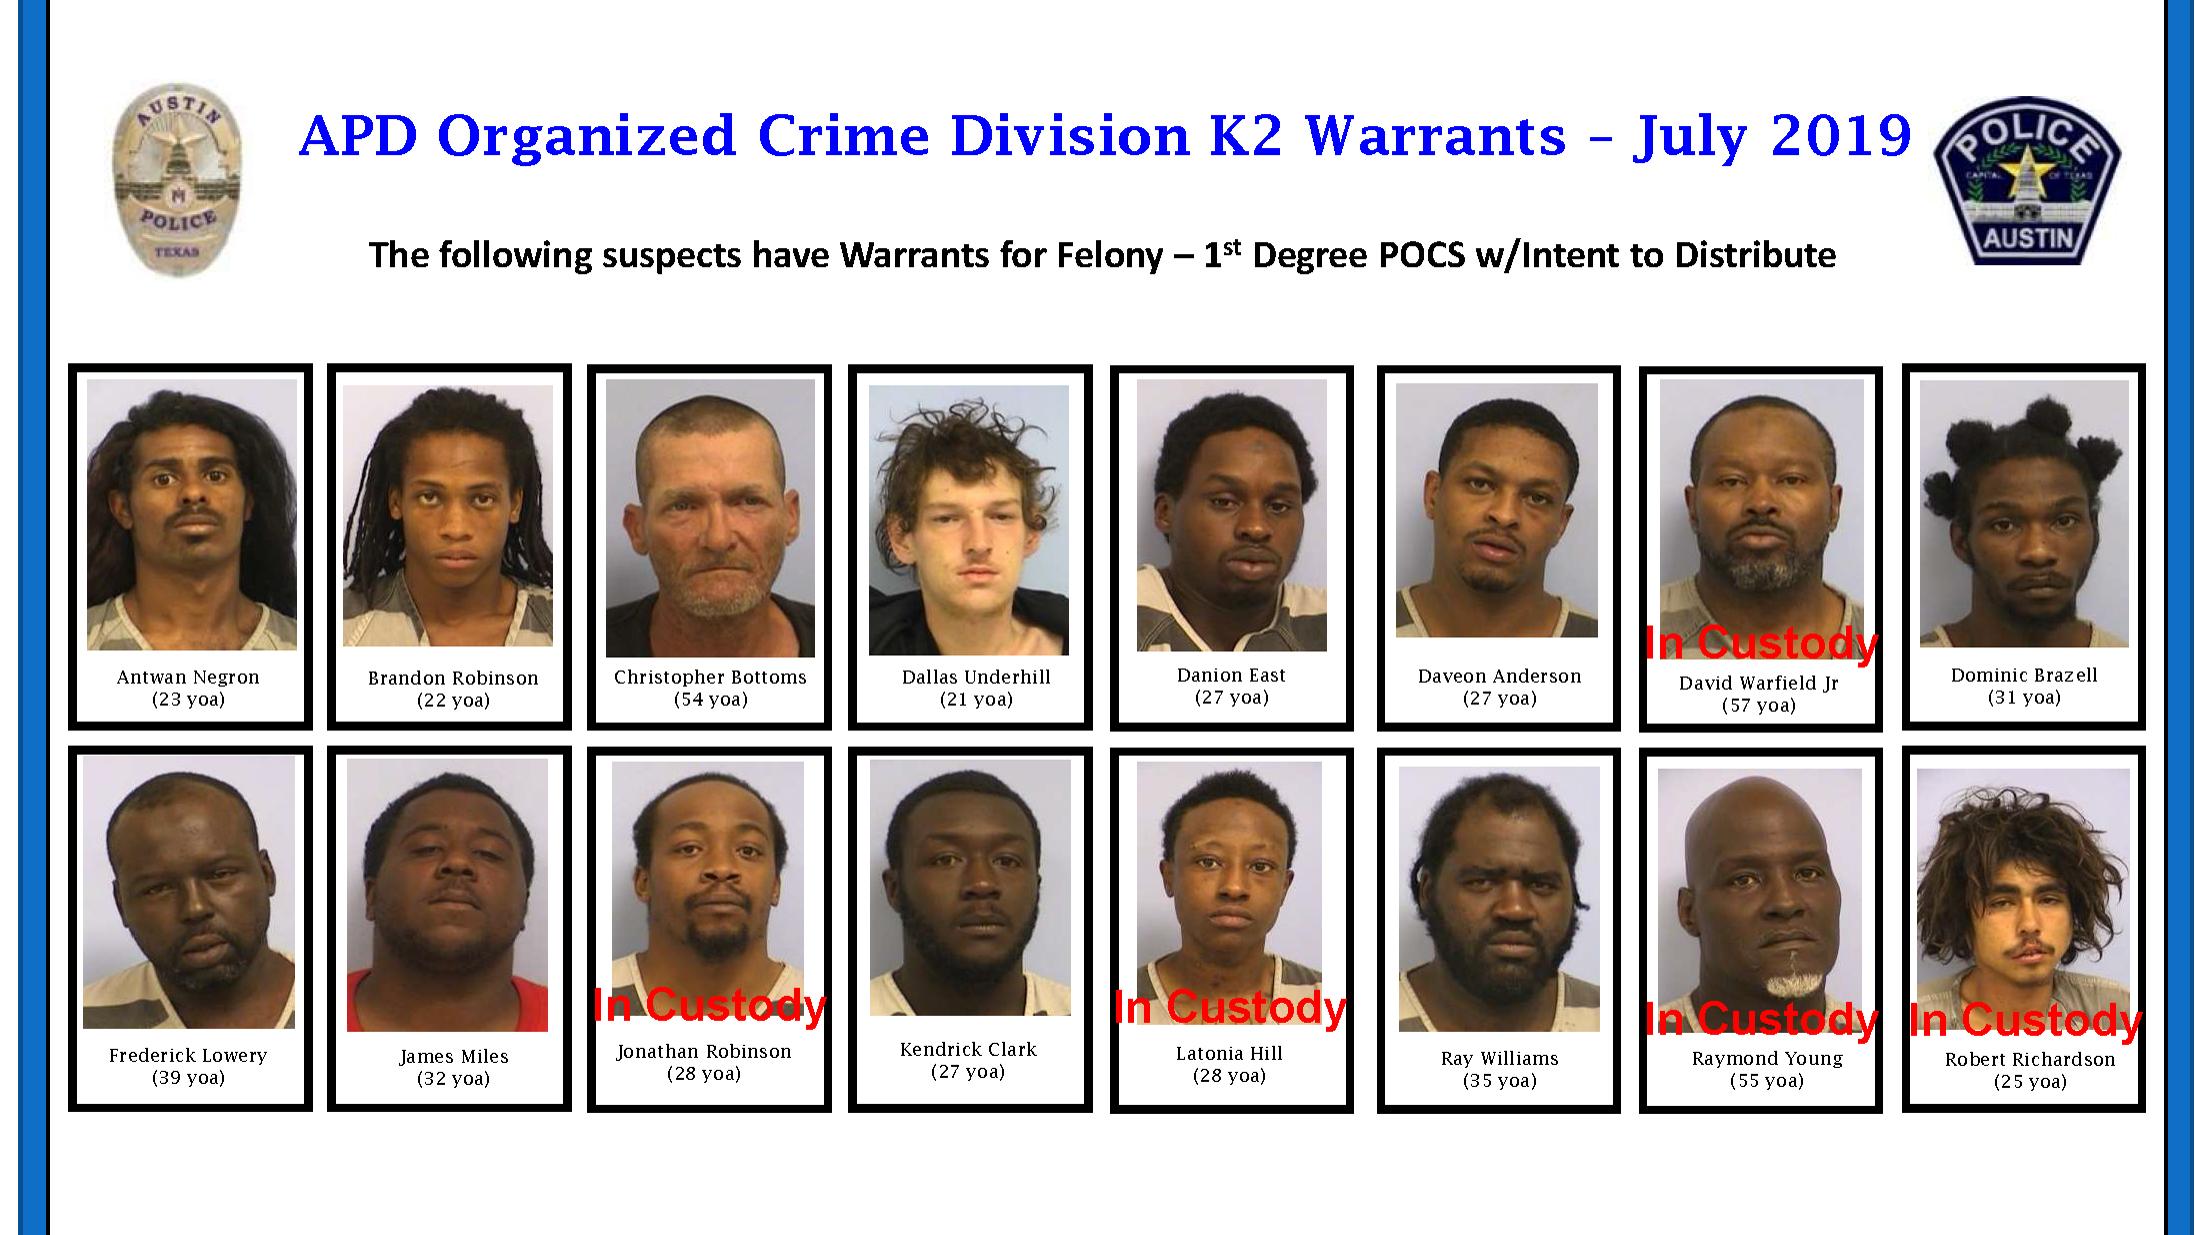 Arrest warrants issued for 16 in K2 crackdown, APD targeting